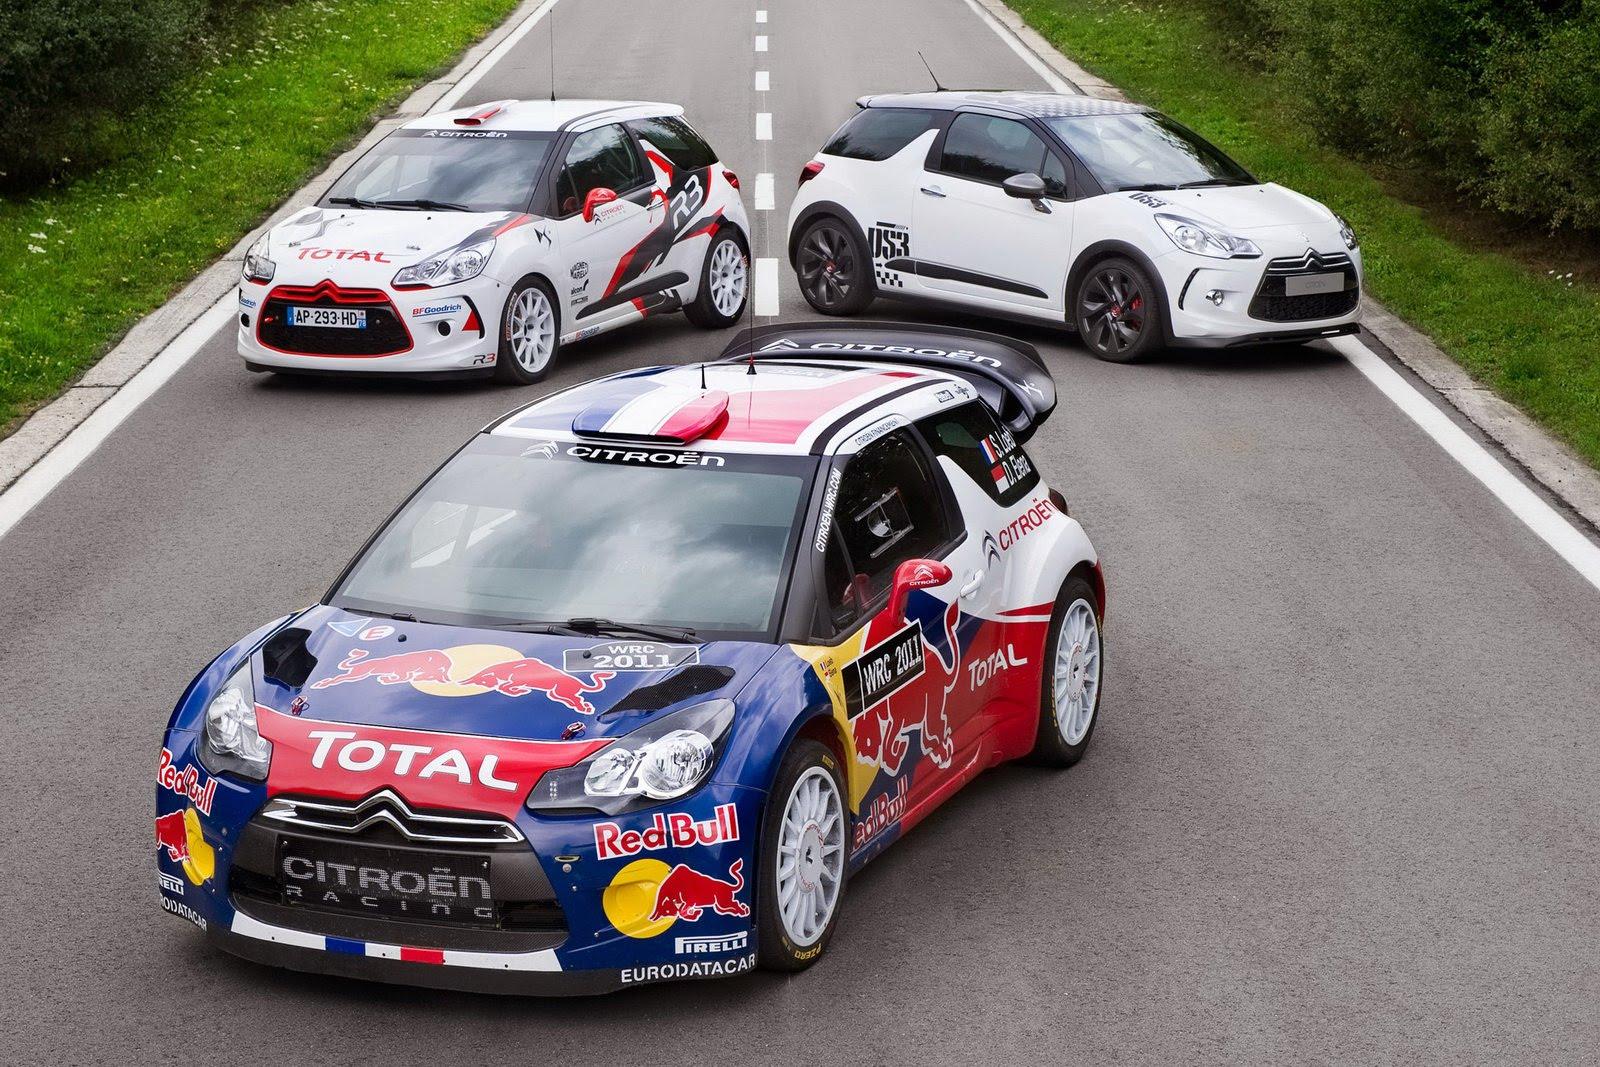 Download 67+ Gambar Mobil Rally Paling Bagus Gratis